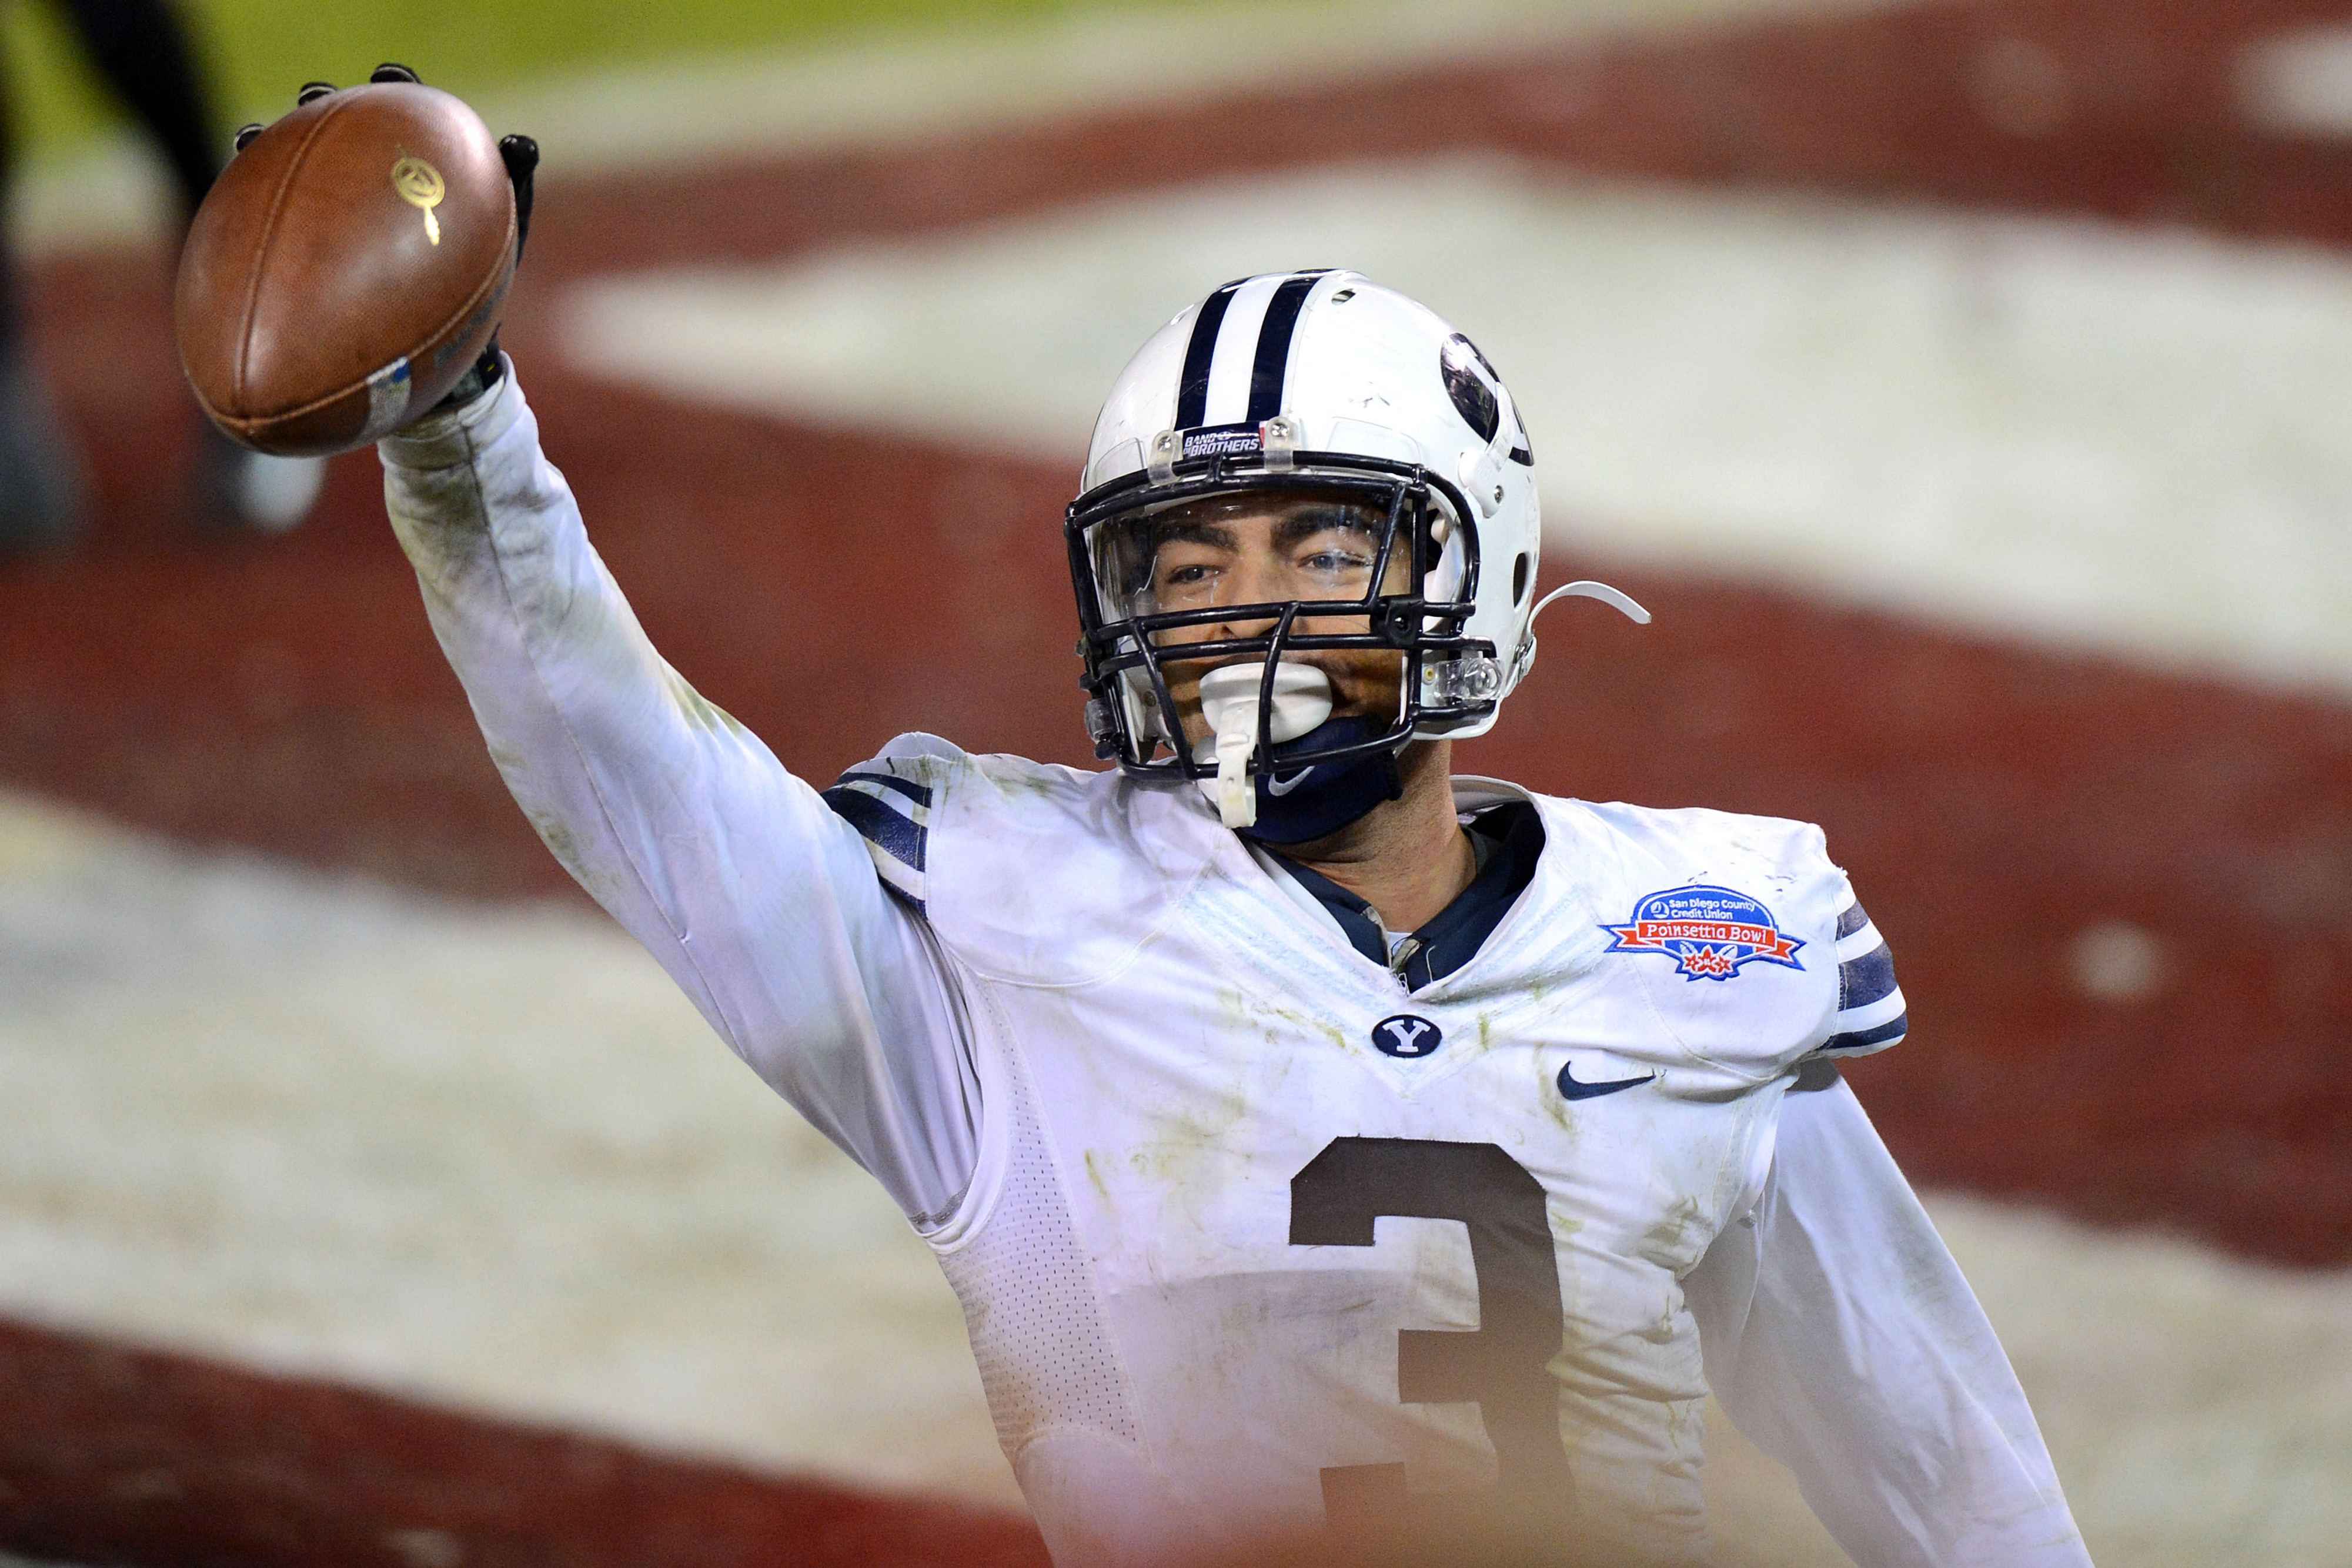 Van Noy celebrates a touchdown against San Diego State in the 2012 Poinsettia Bowl.